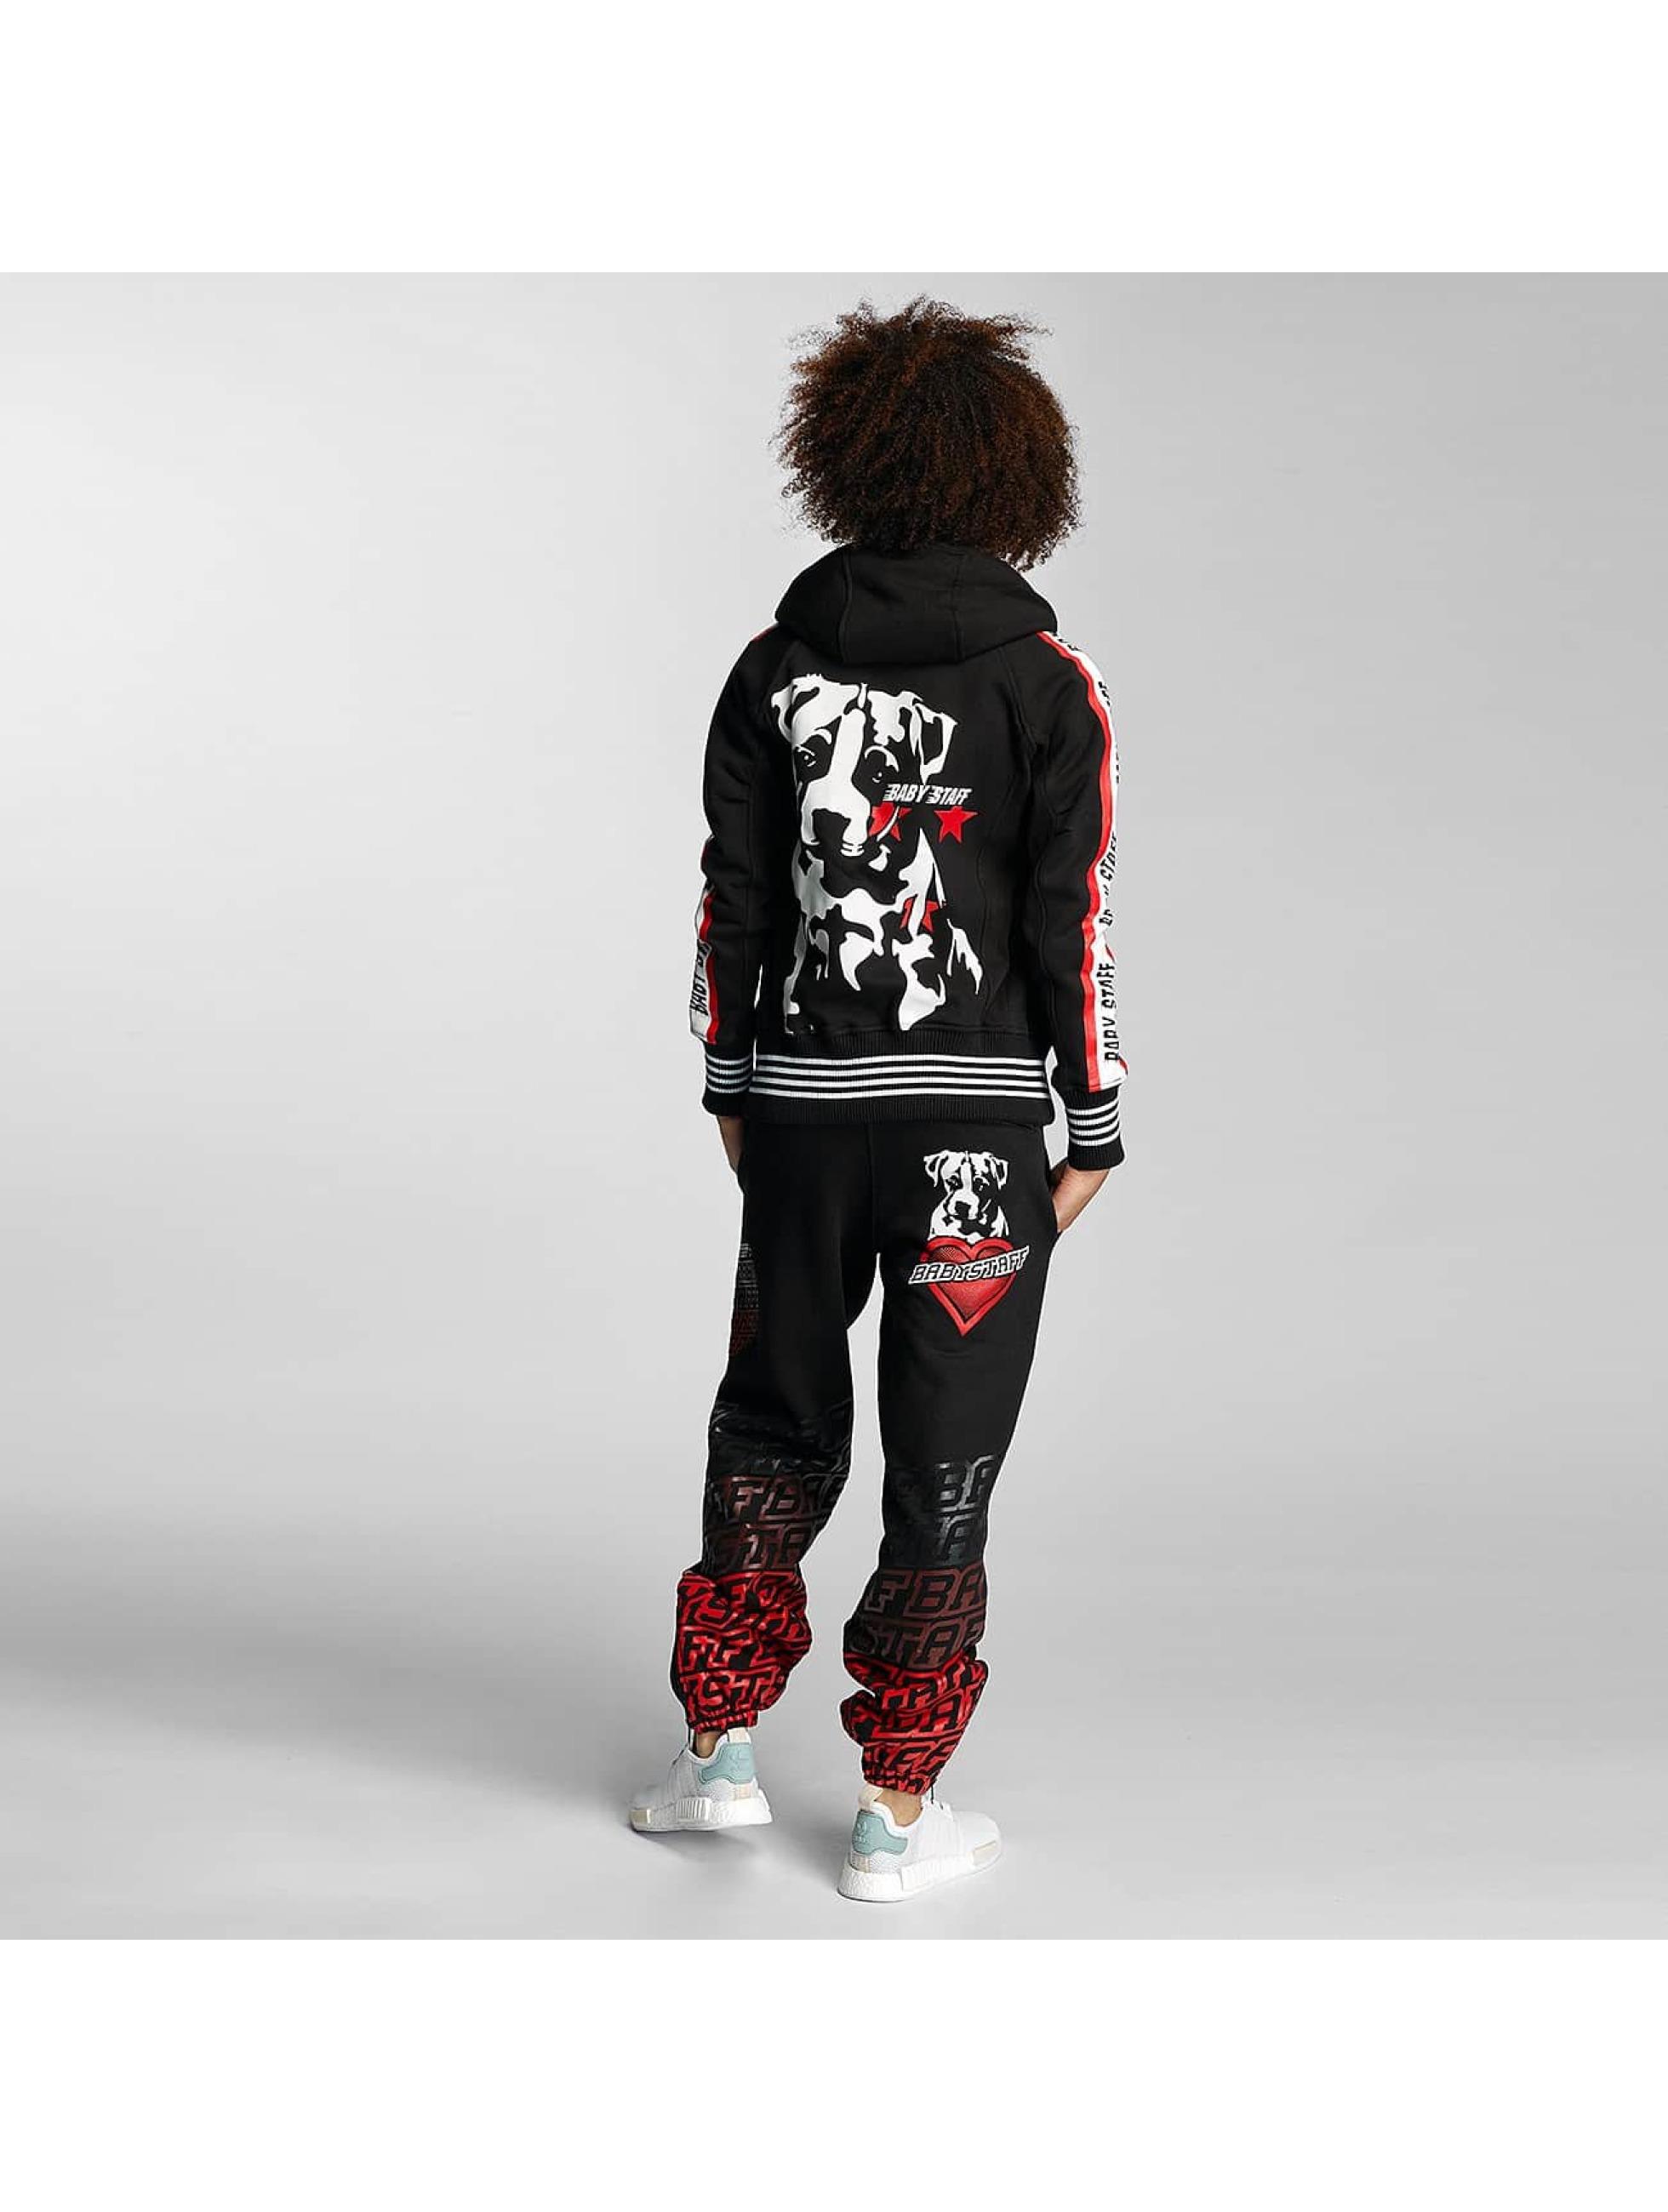 Babystaff Zip Hoodie Weloo black